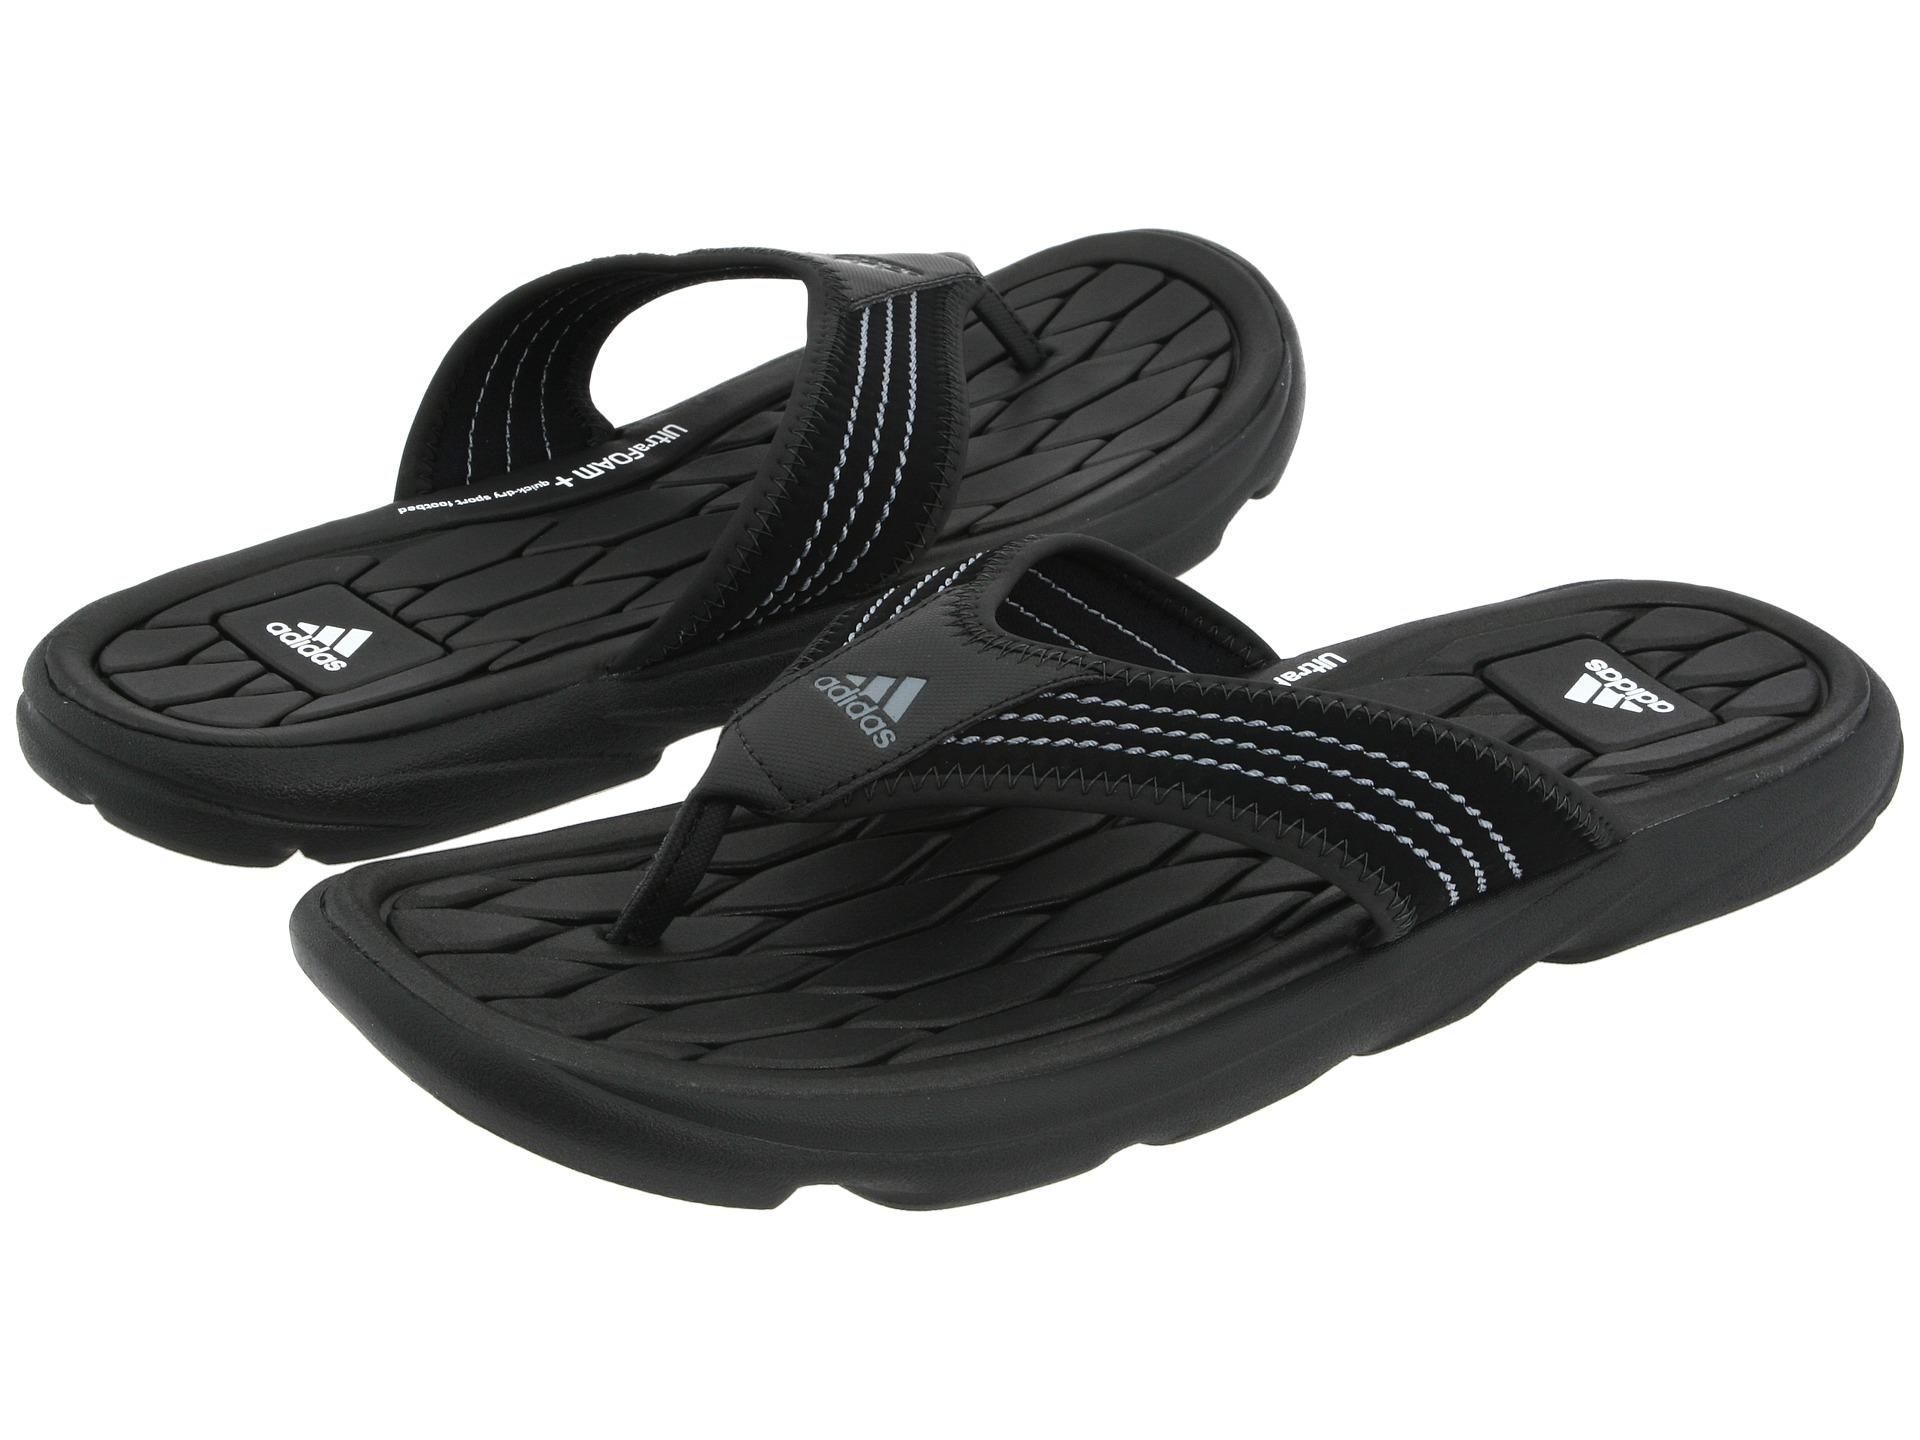 addd8042d Lyst - adidas Originals Raggmo Thong Sc in Black for Men